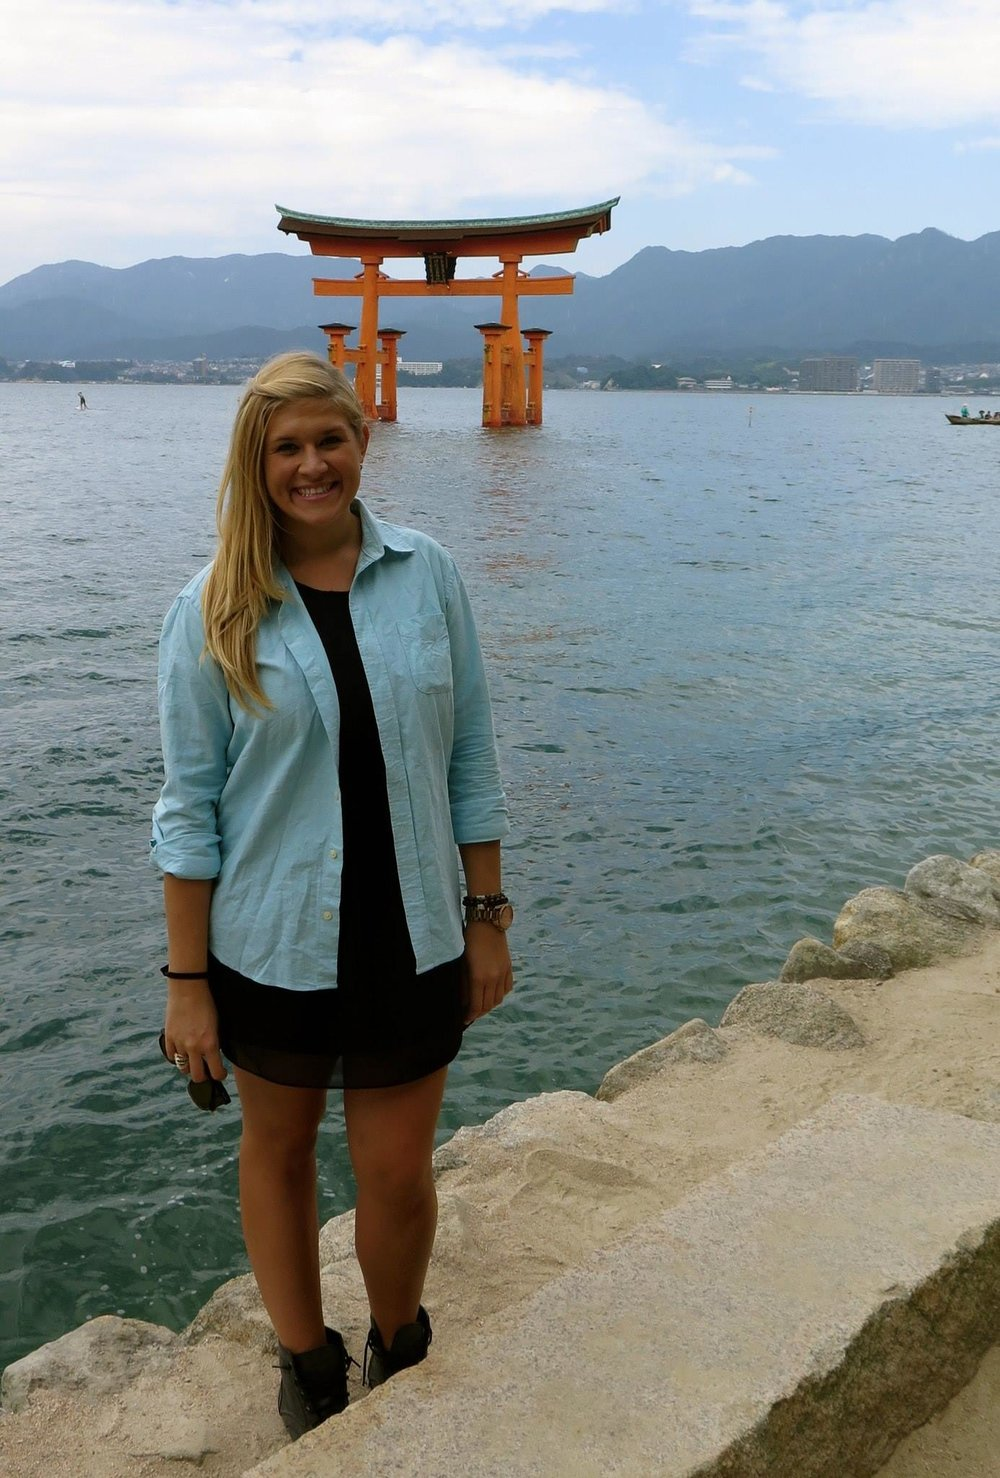 Japan, Itsukushima Shrine (厳島神社 Itsukushima-jinja) is a Shinto shrine on the island of Itsukushima.jpg